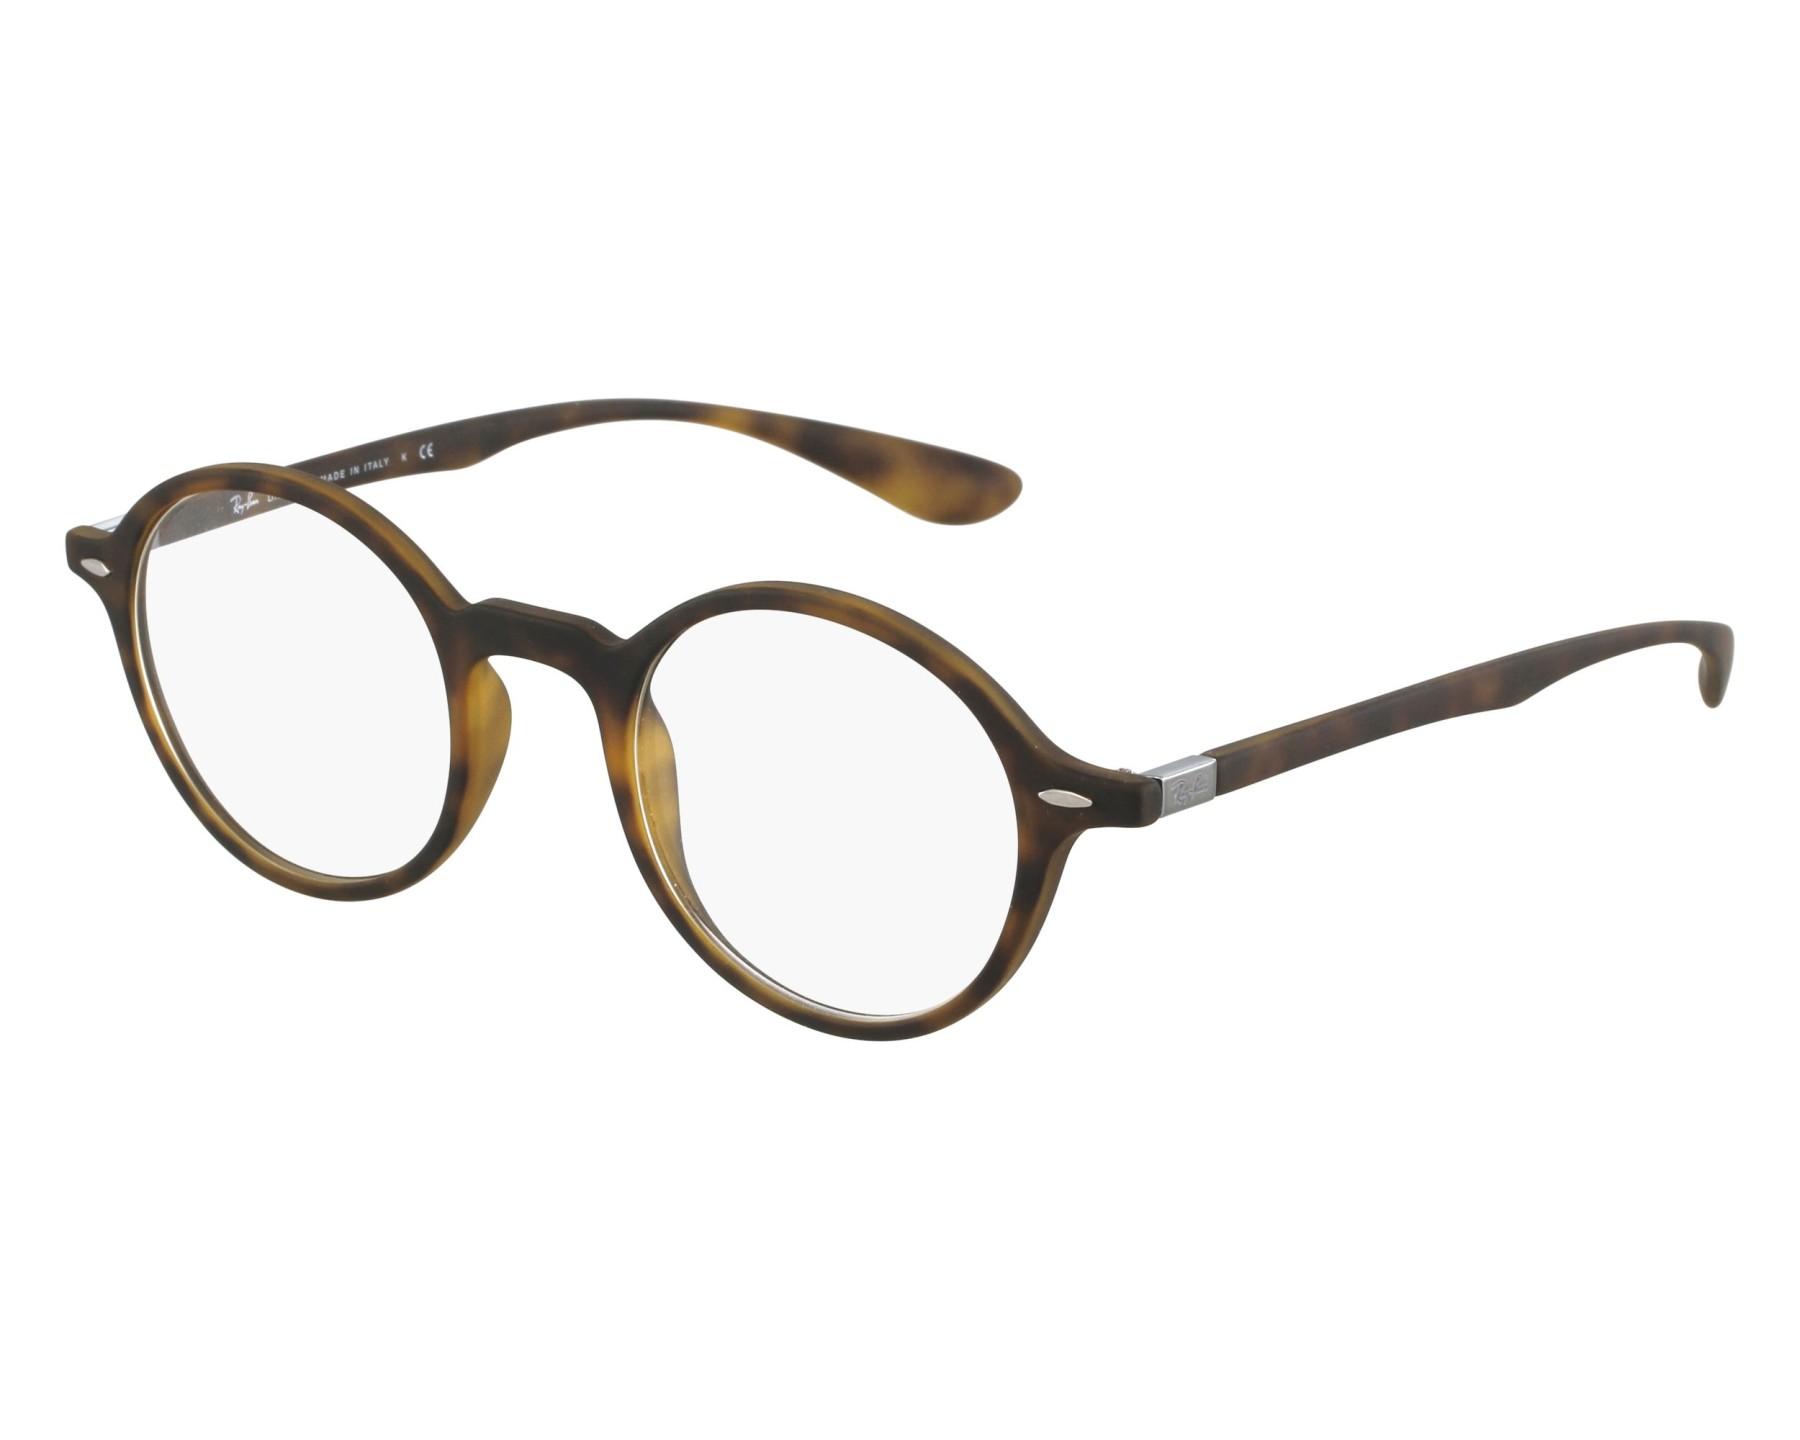 c8d39cfb8e448 eyeglasses Ray-Ban RX-7069 5200 43-22 Brown Gun front view